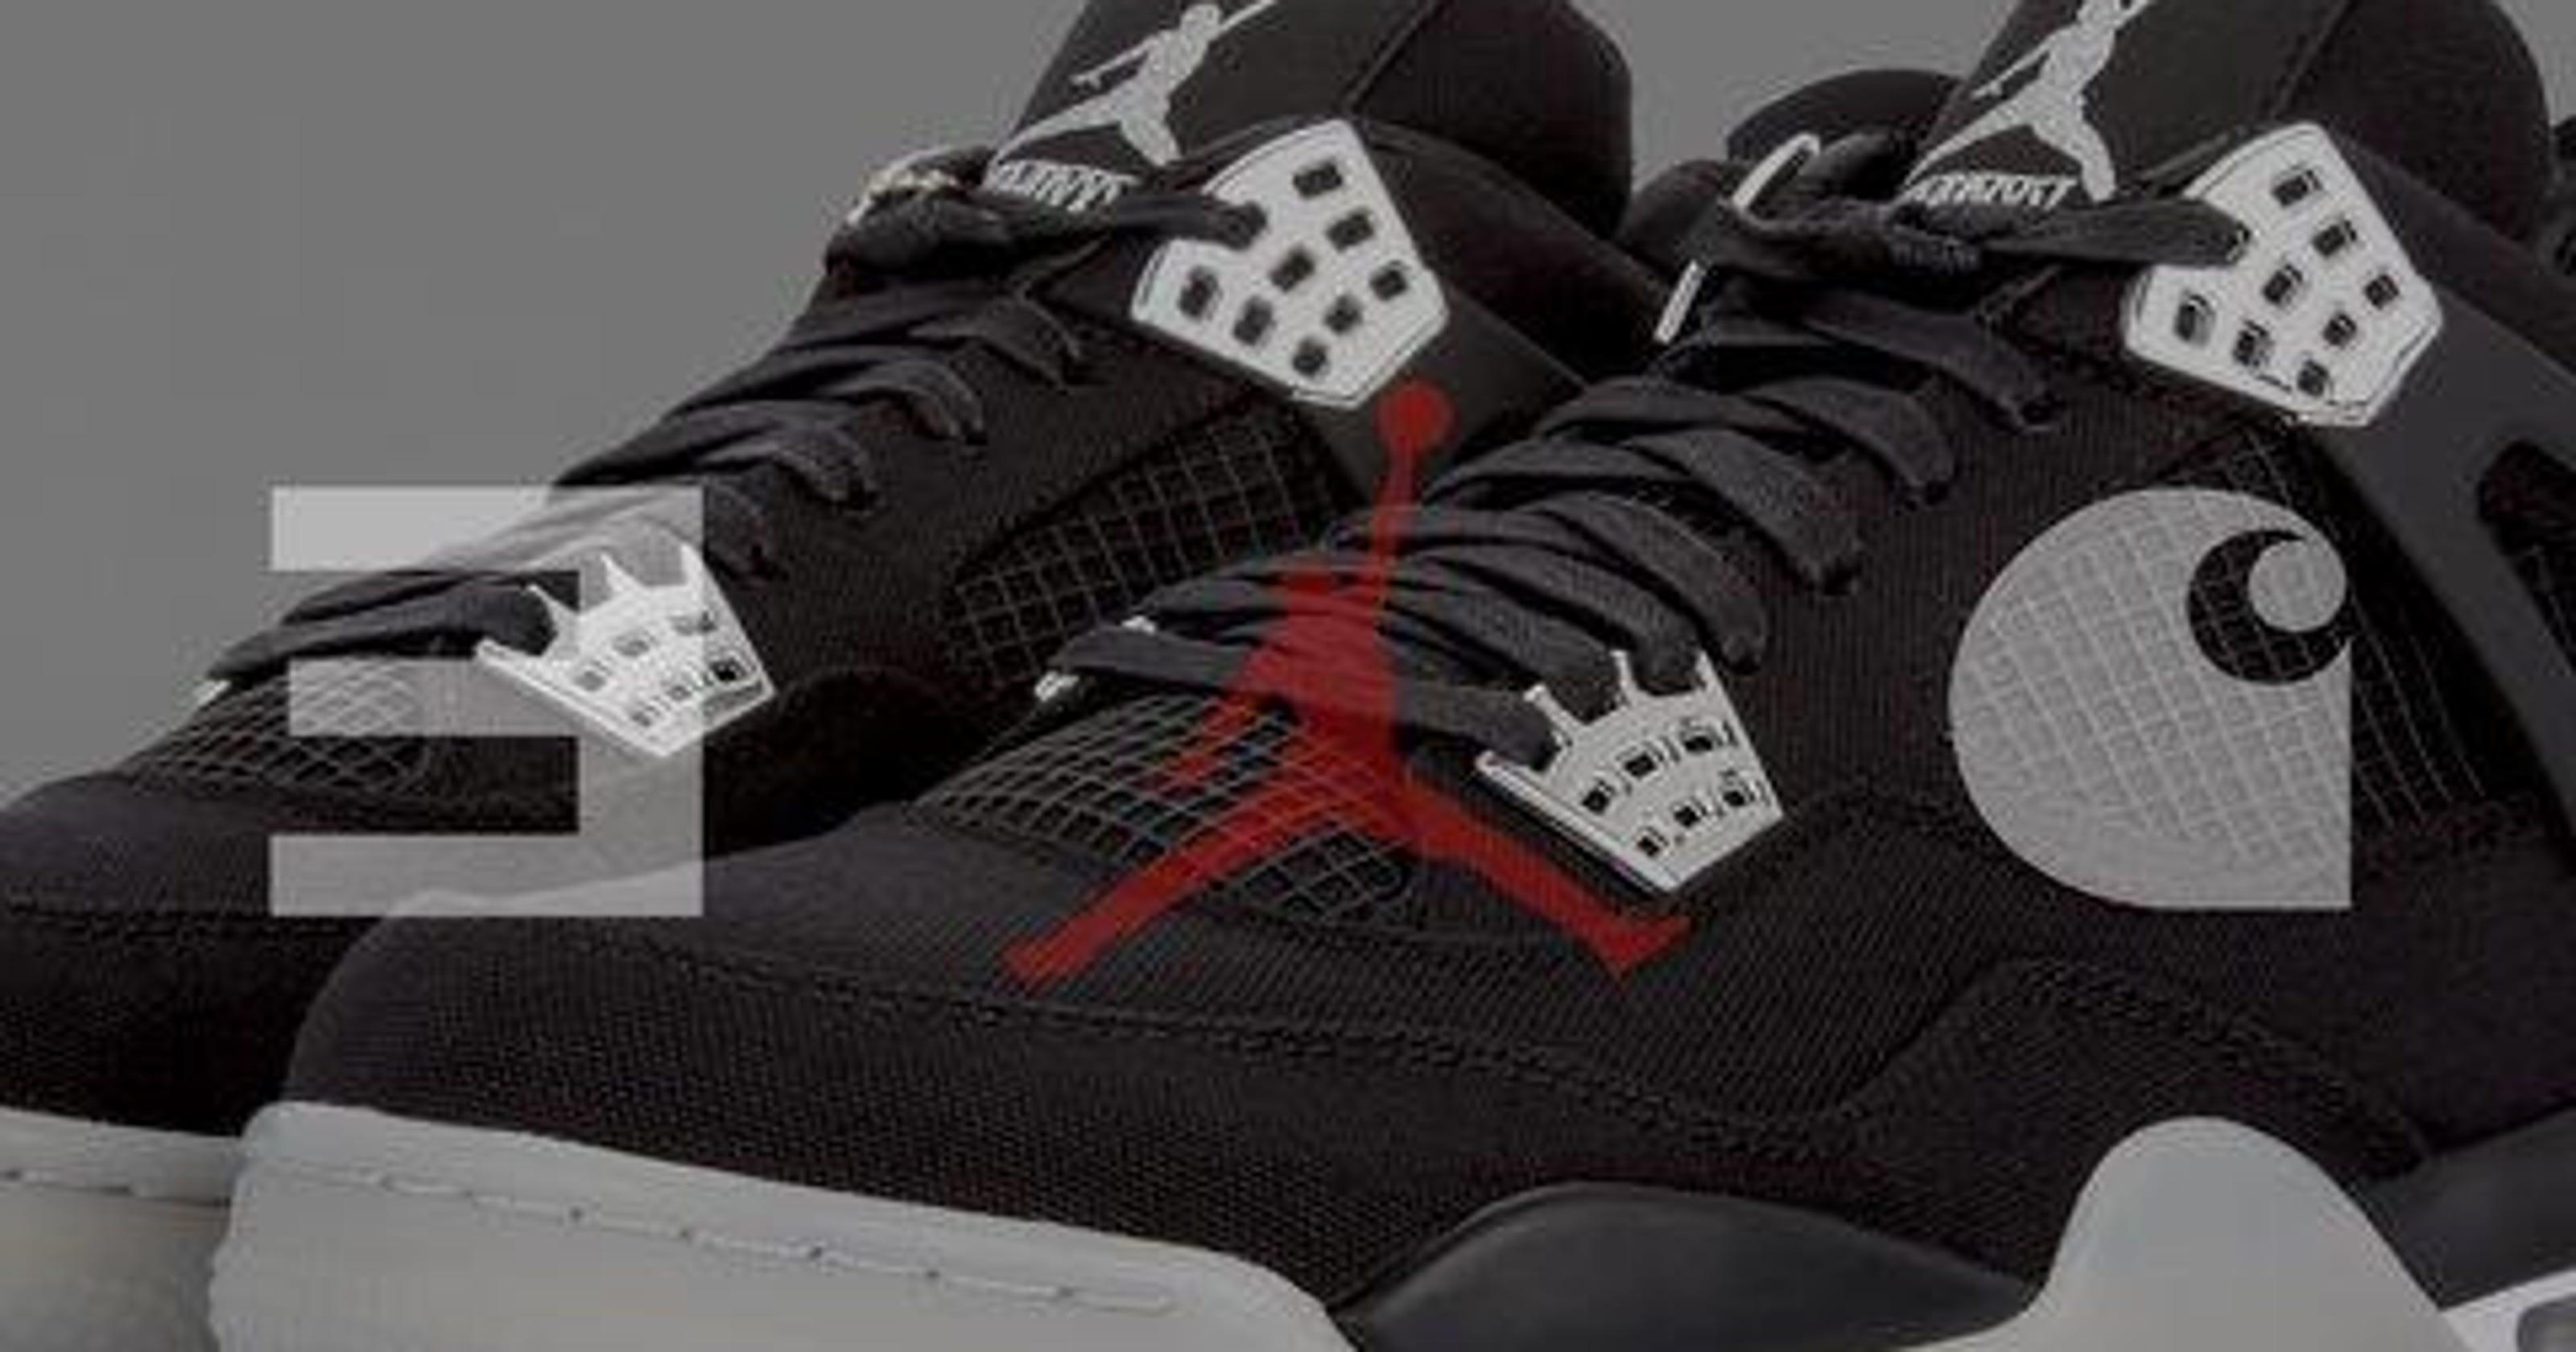 42aae825c46 Eminem s Carhartt-branded Air Jordans auction under way